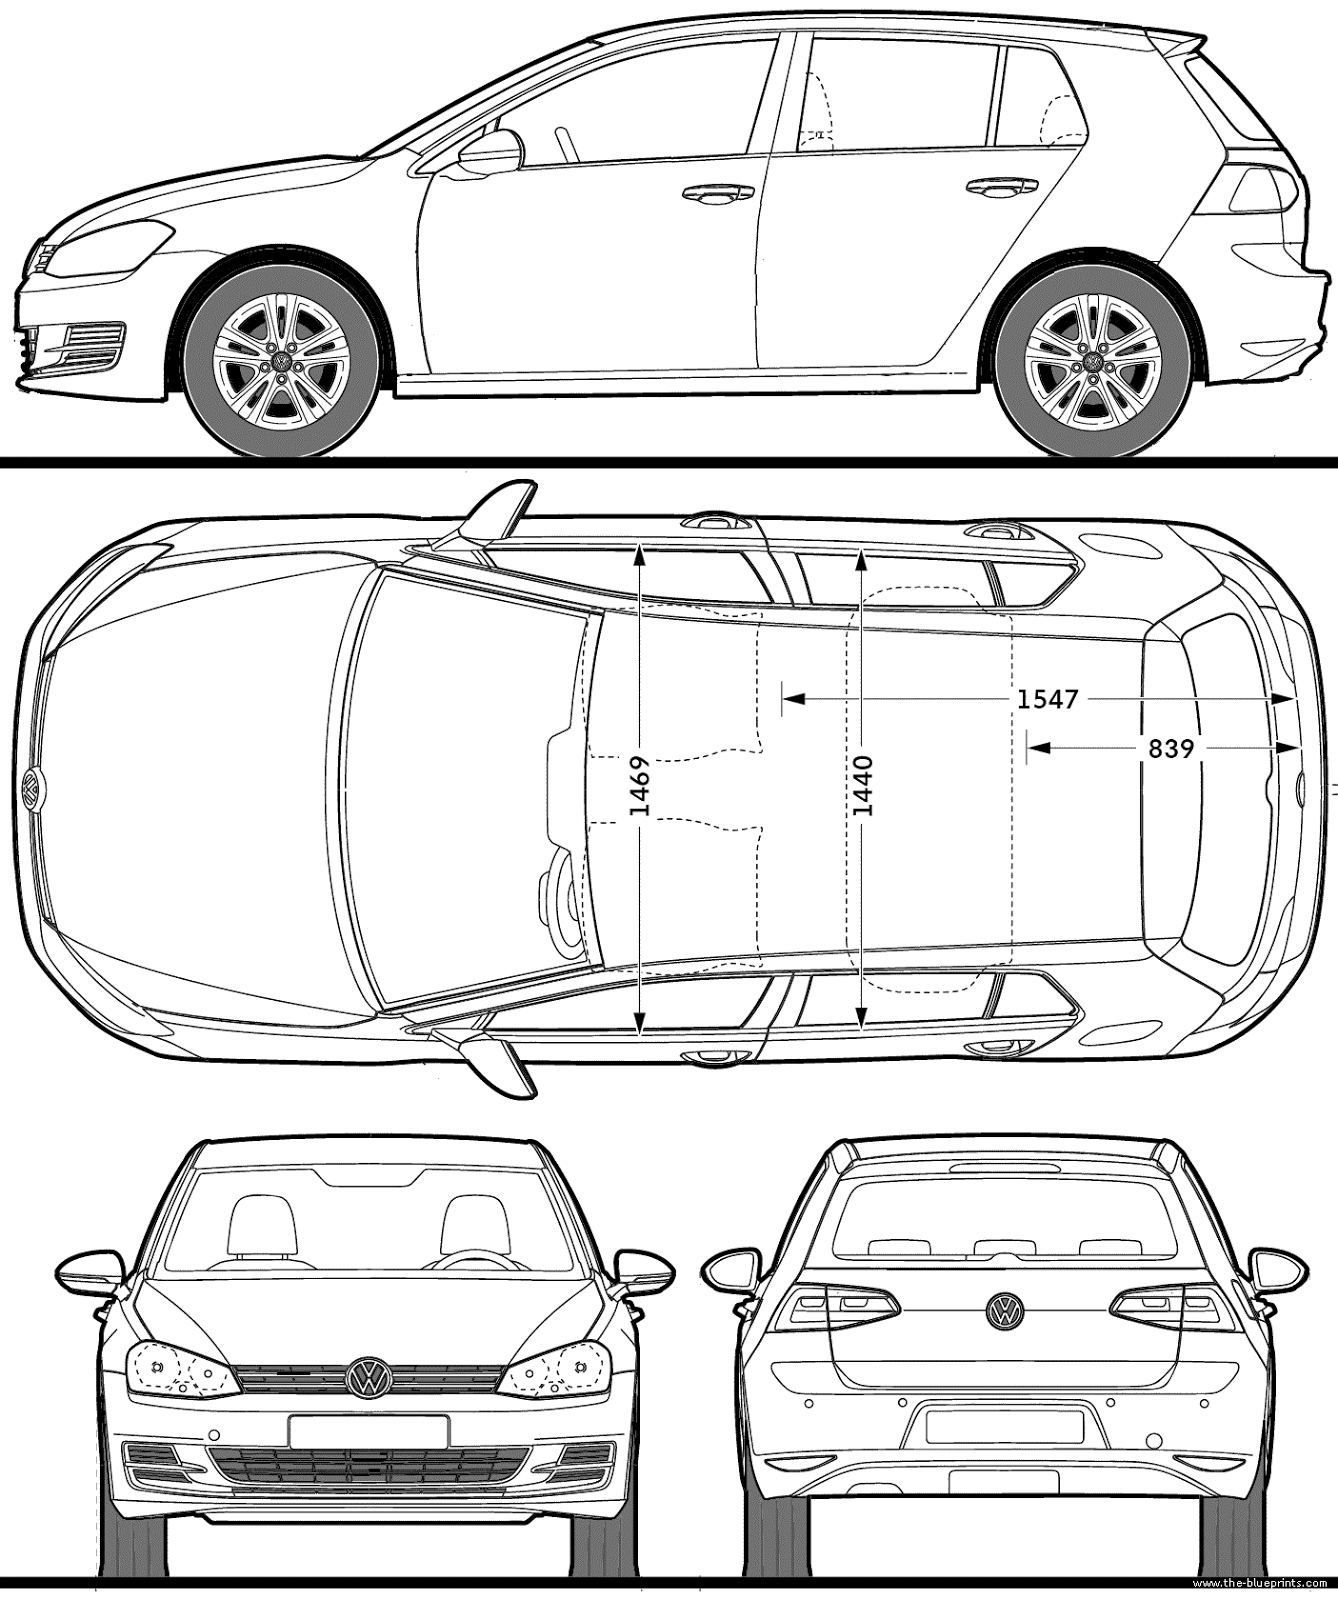 Volkswagen golf 5 blueprints pinterest volkswagen golf most loved car blueprints for modeling malvernweather Gallery